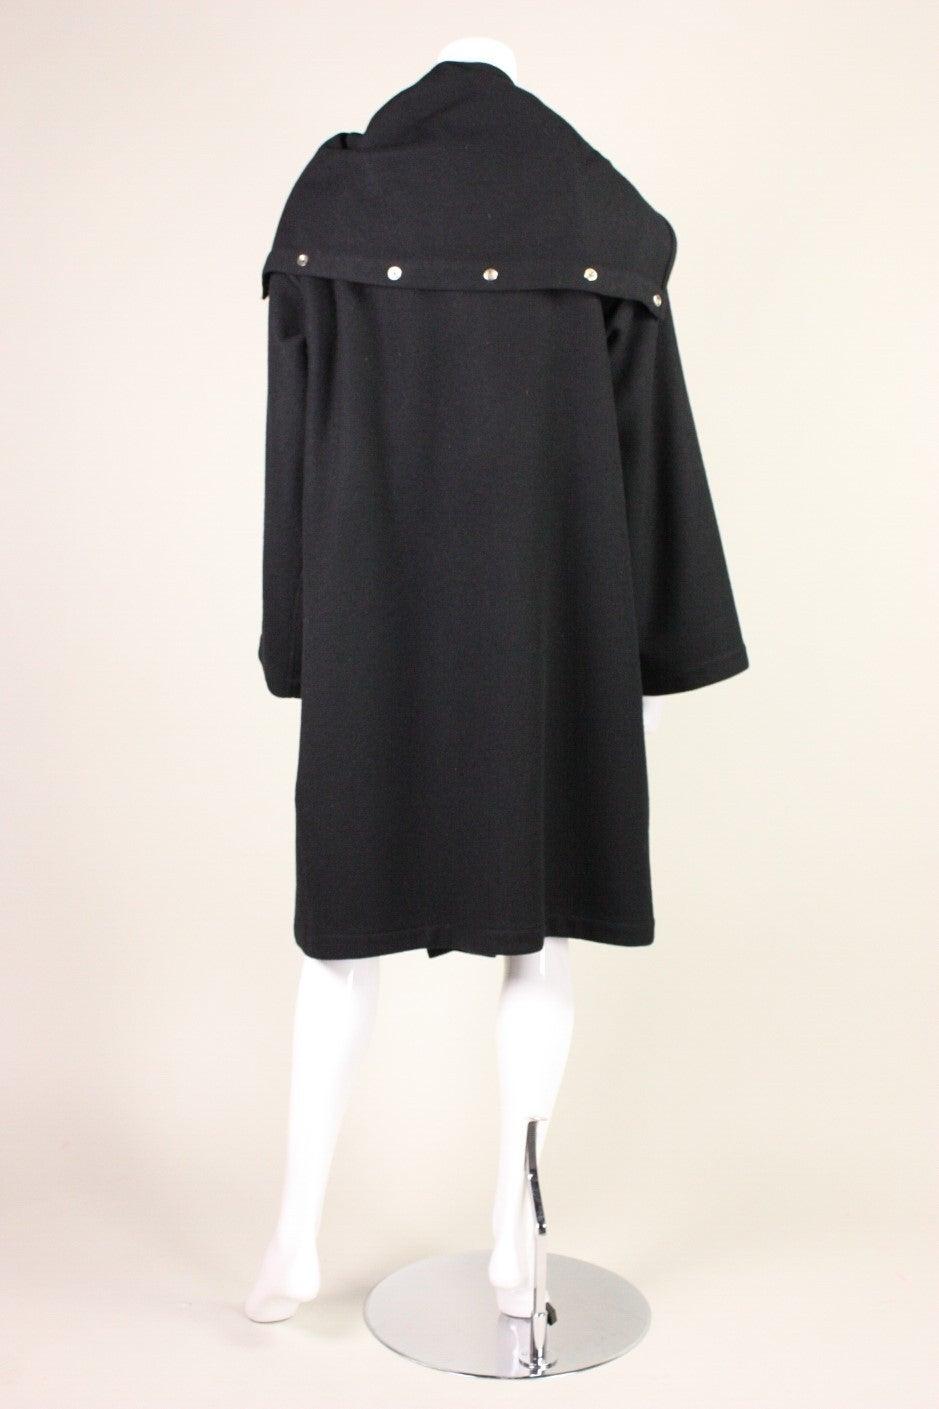 Jean-Charles de Castelbajac Wool Coat with Appliqued Figure 4